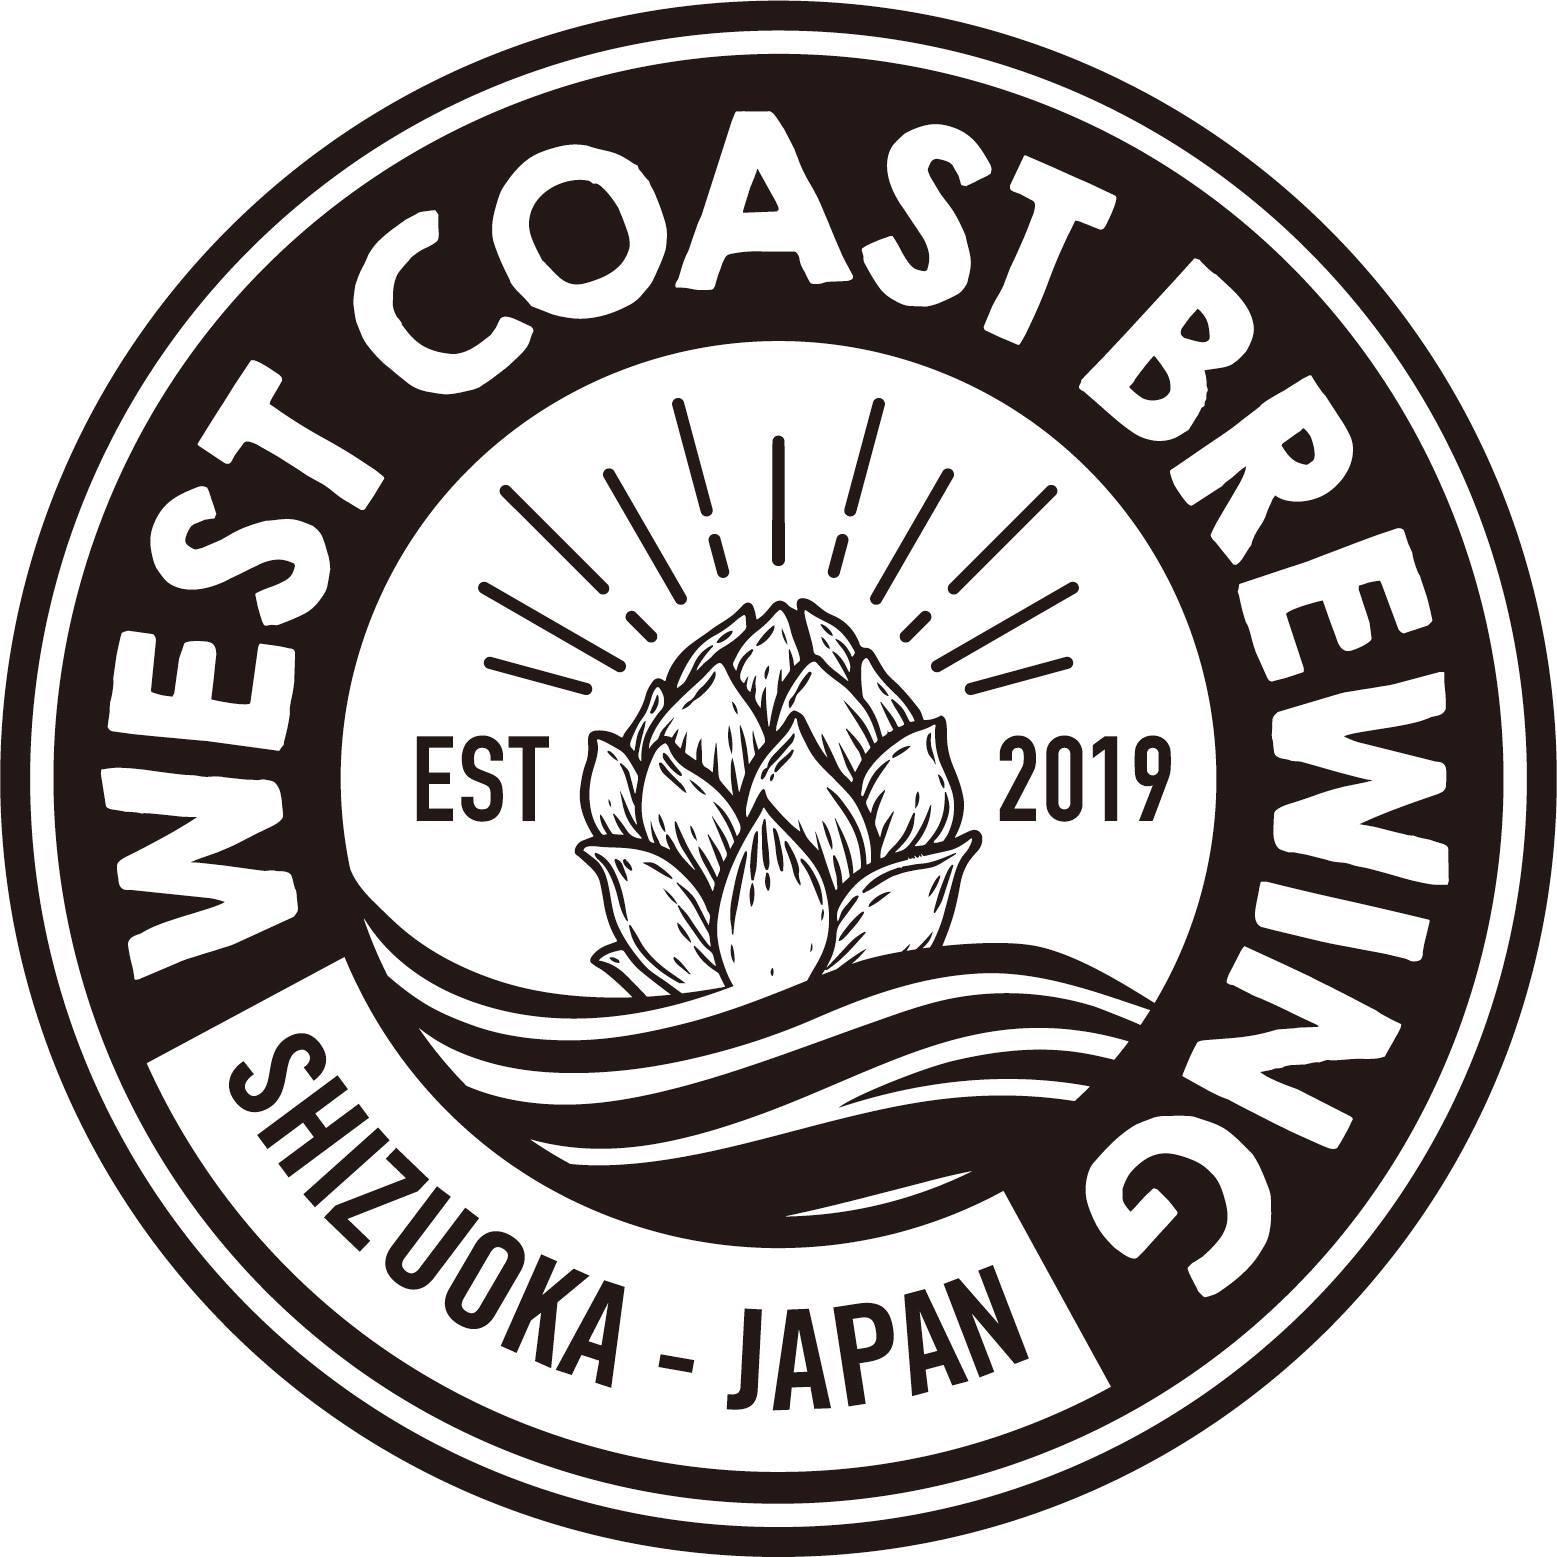 West Coast Brewing